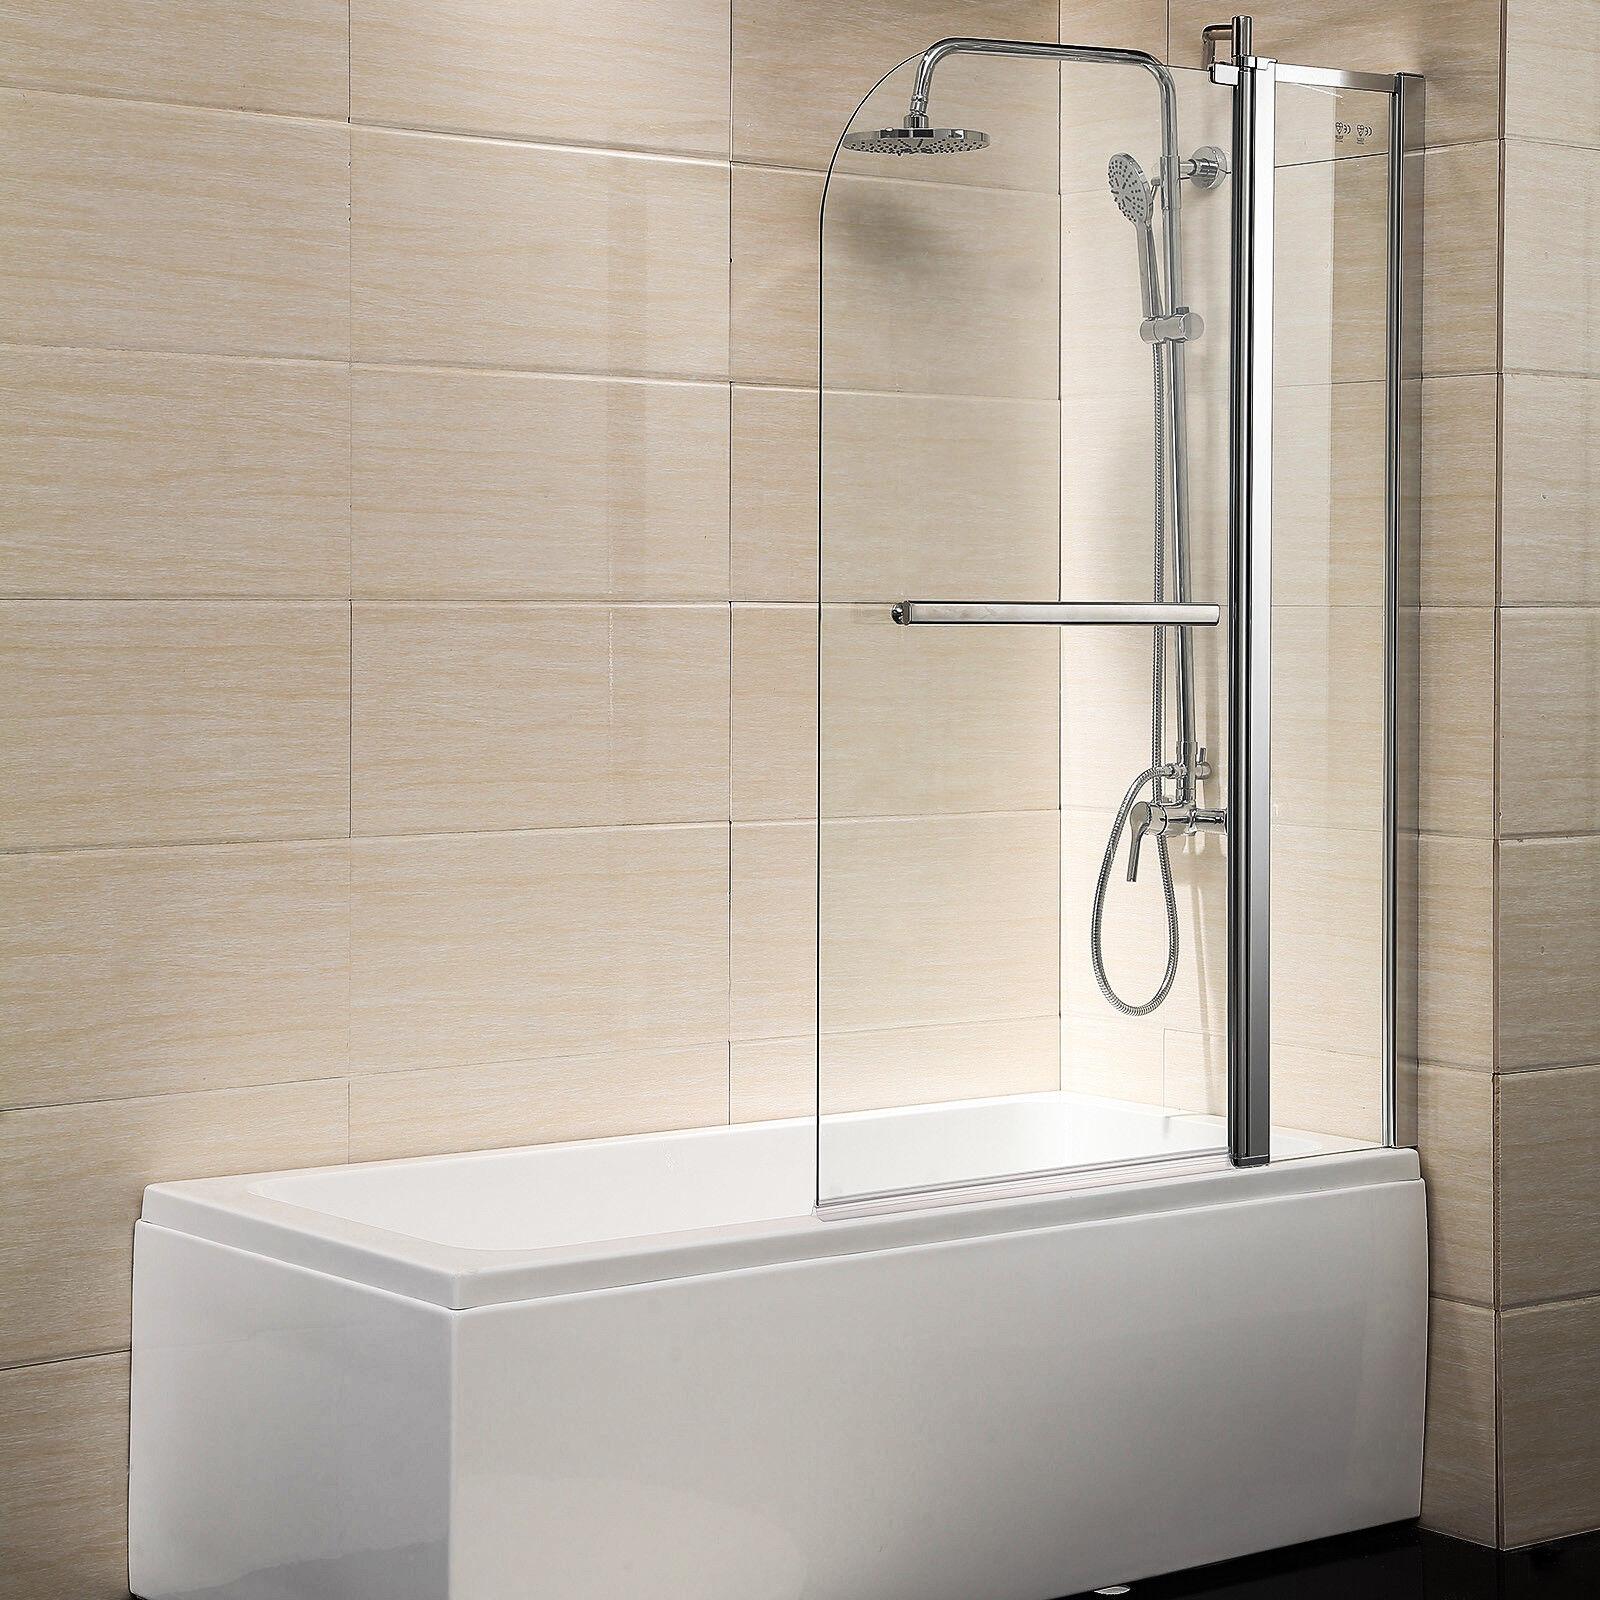 Pivot Radius Framed 1 4 Clear Glass 55 X39 Bath Tub Shower Door Chrome Finish